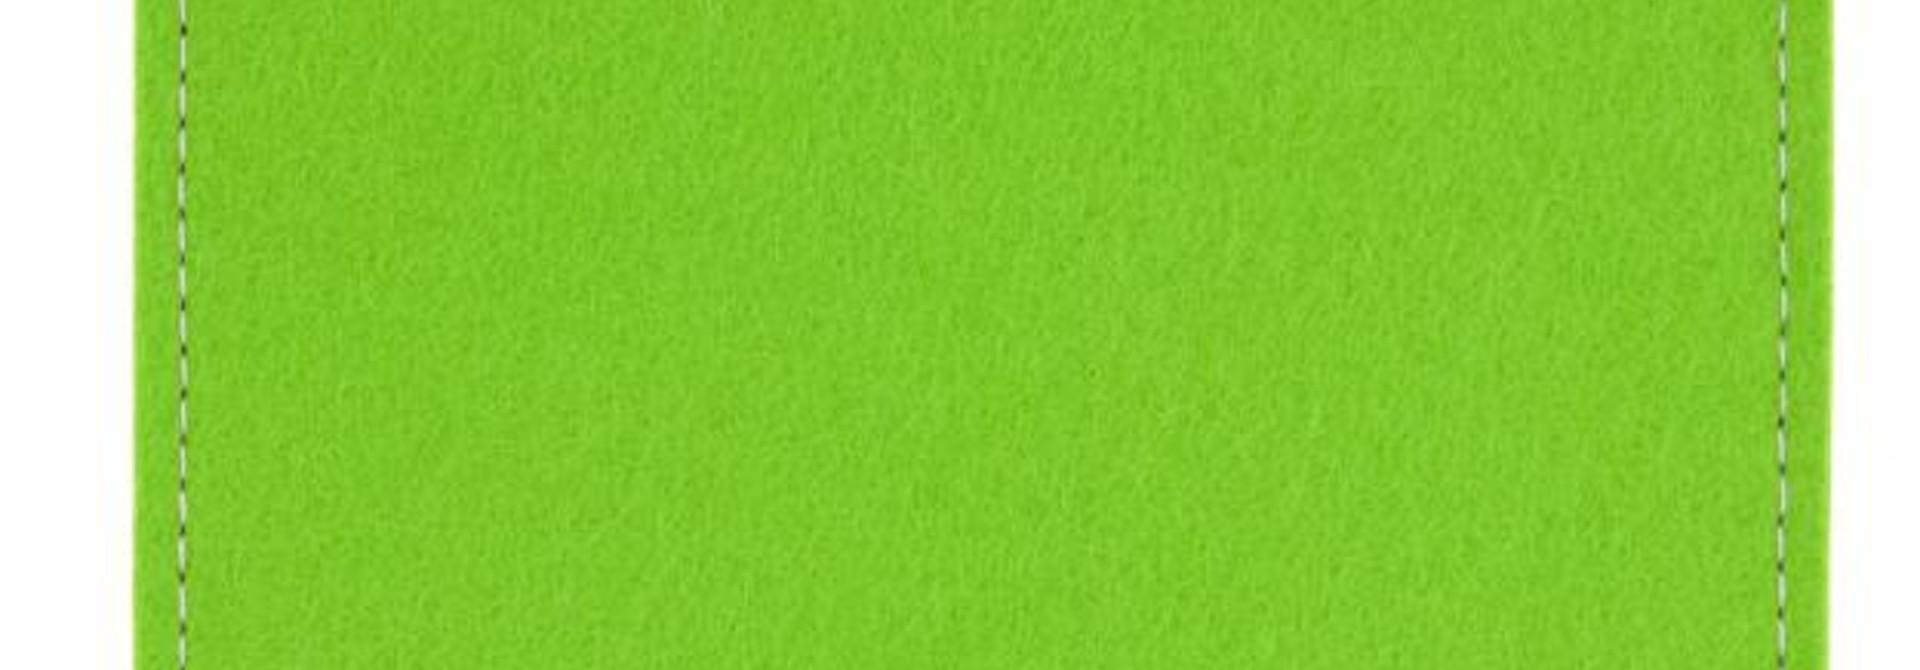 eBook Sleeve Bright-Green